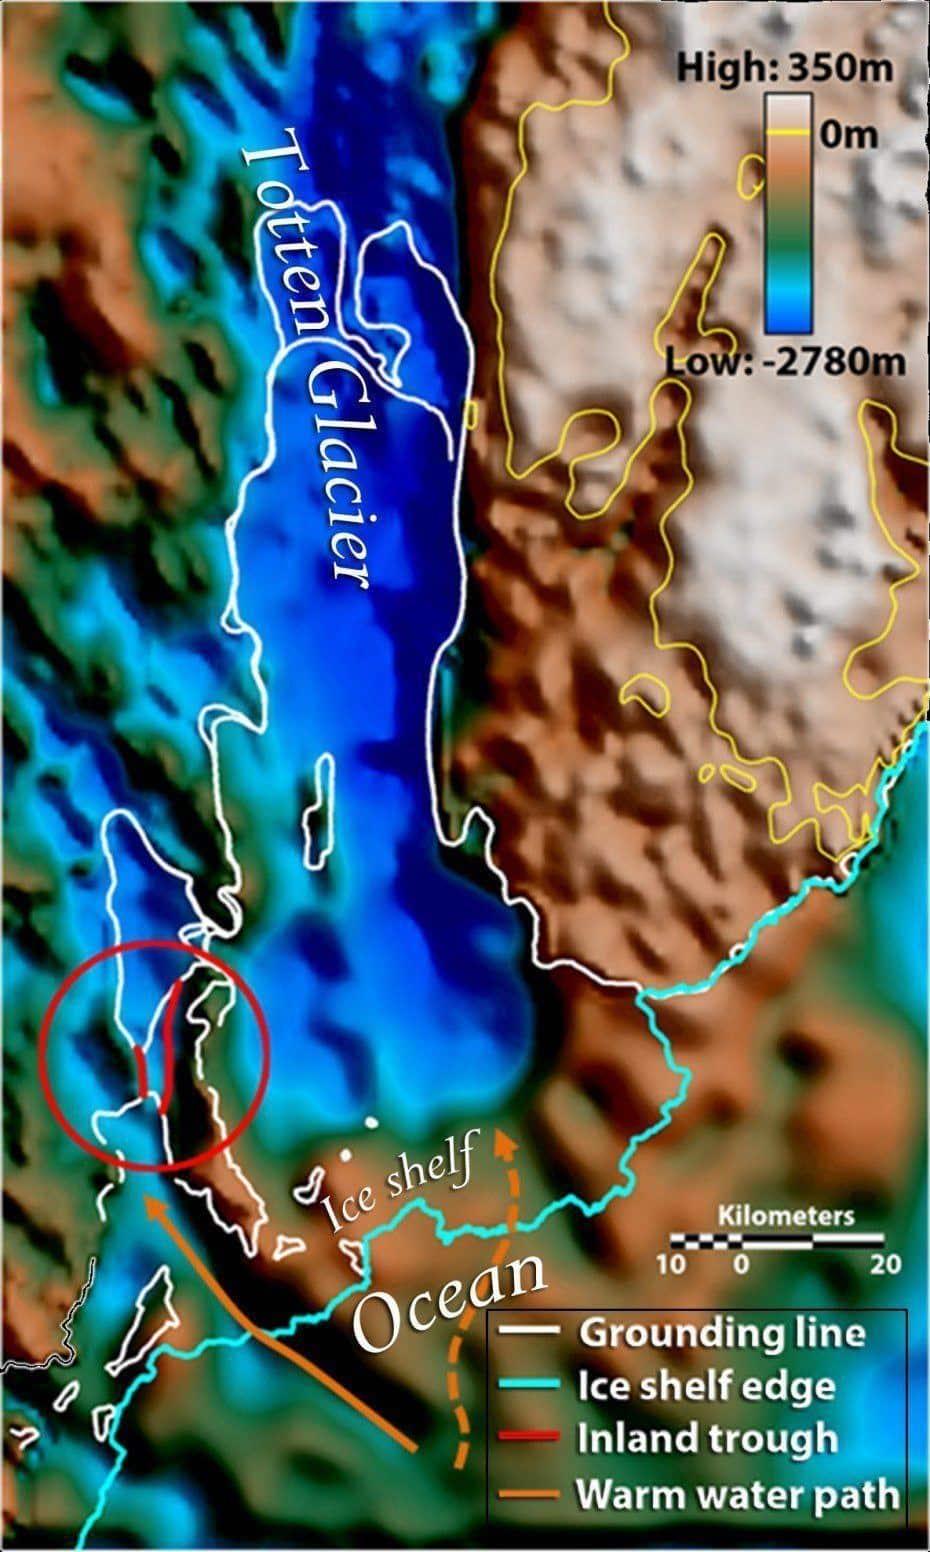 East Antarctica Melting